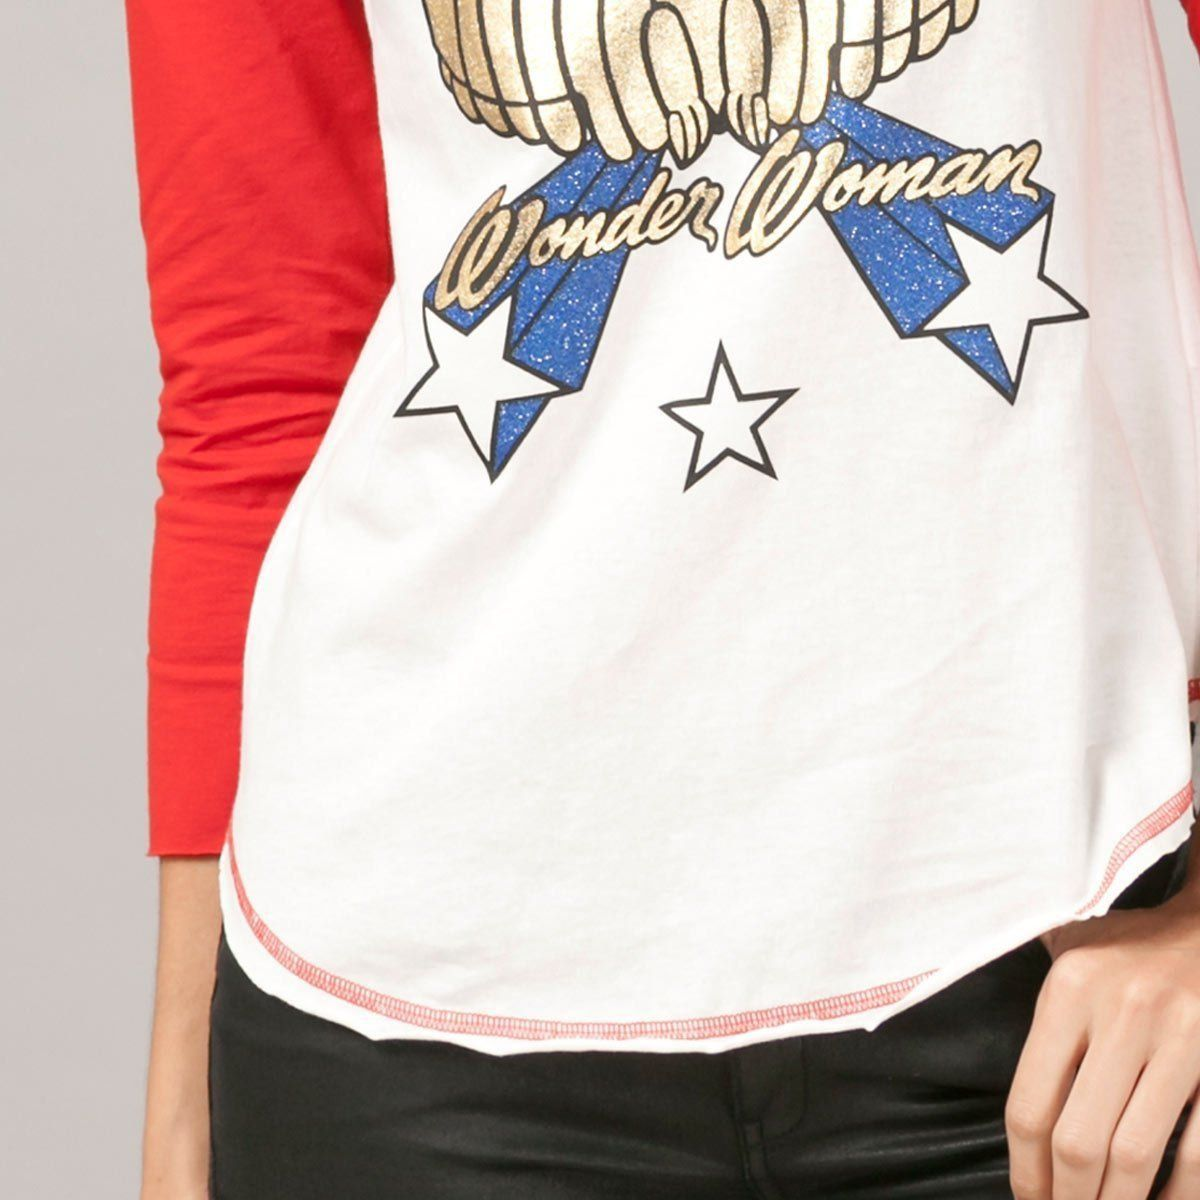 Camiseta Manga Longa Feminina Mulher Maravilha Retrô Oficial  - bandUP Store Marketplace